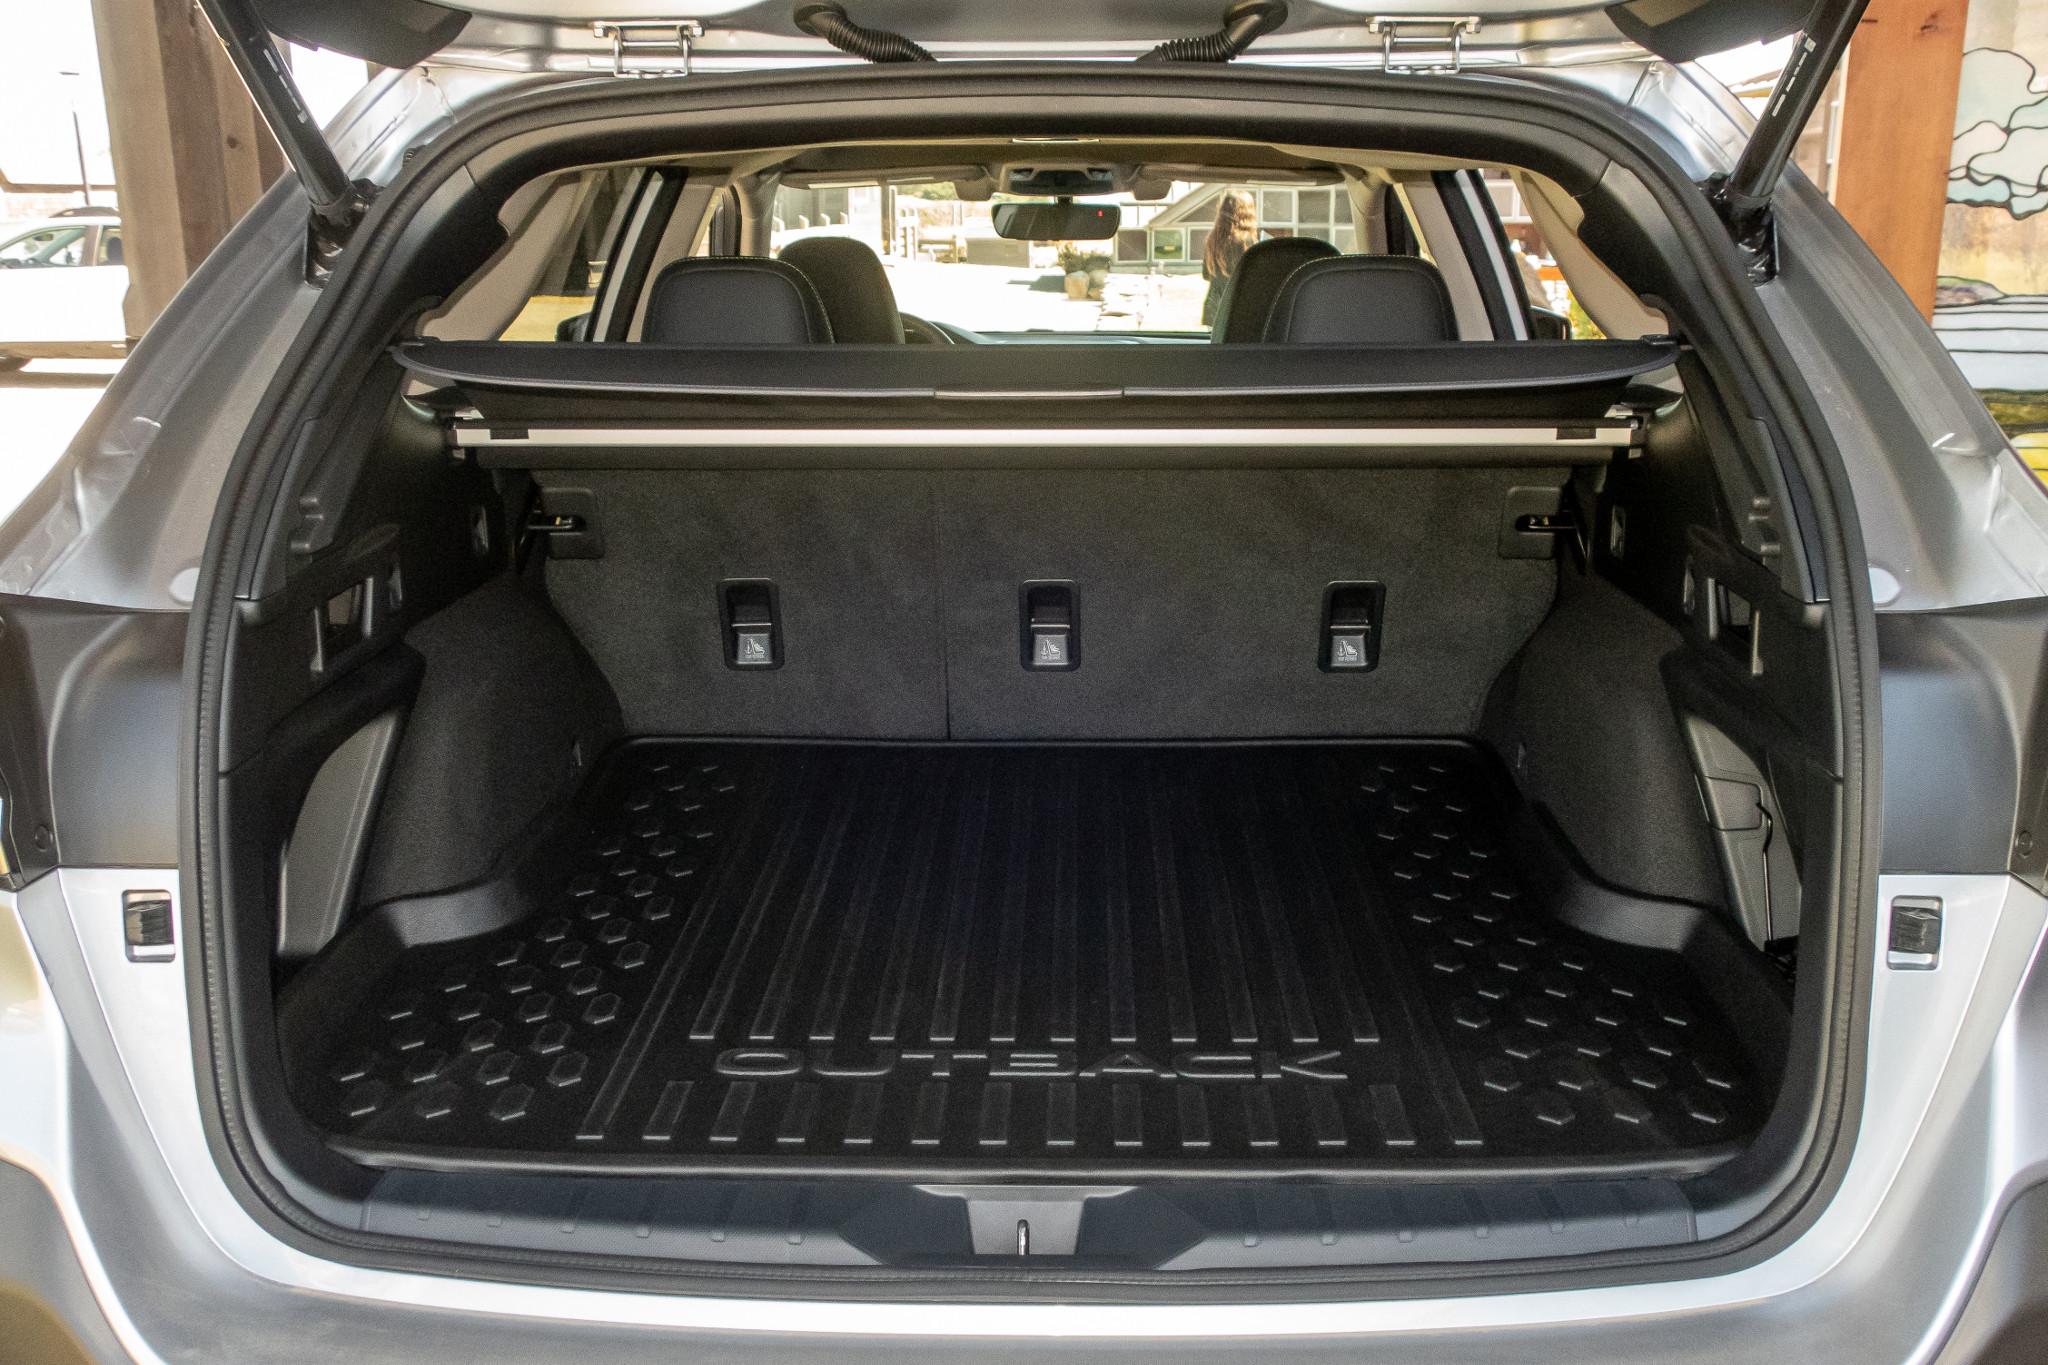 subaru-outback-2020-21-interior--trunk.jpg